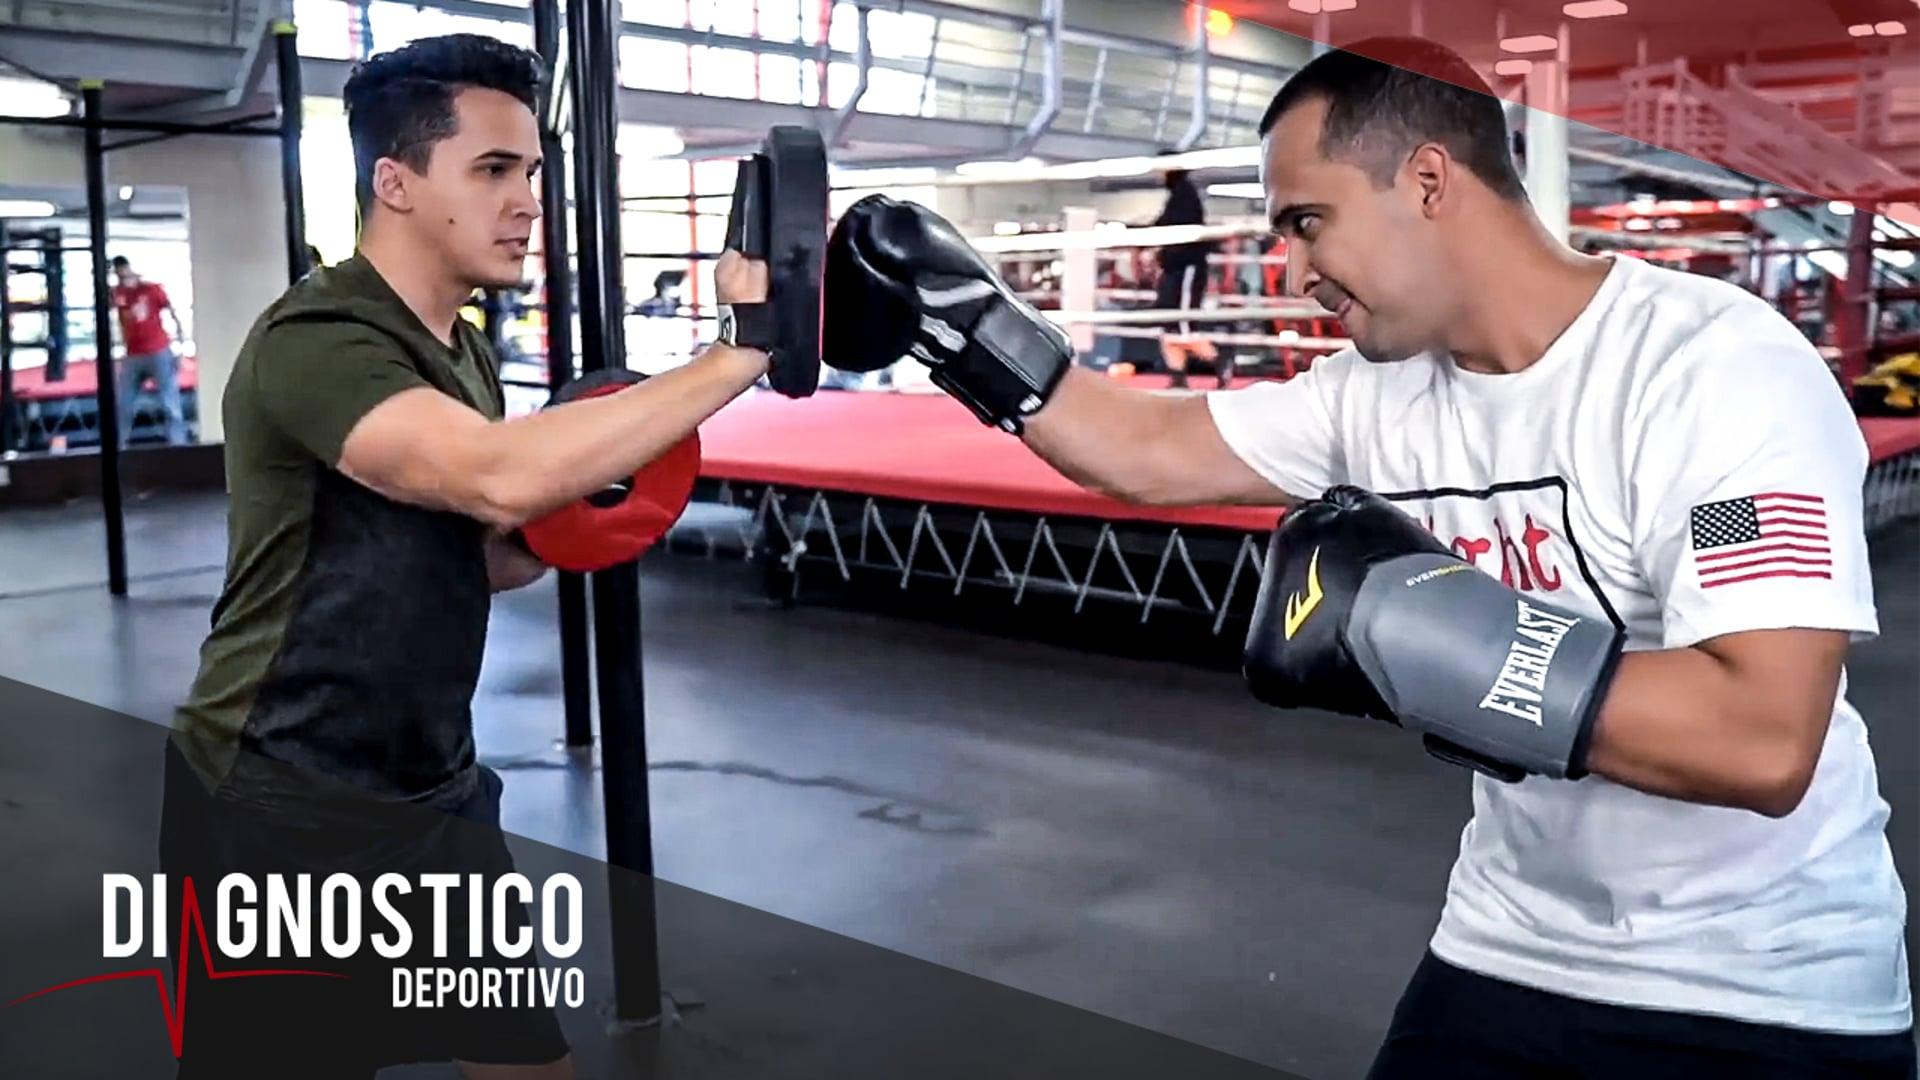 S1-E1 - Detras del Ring de Boxeo - Diagnostico Deportivo